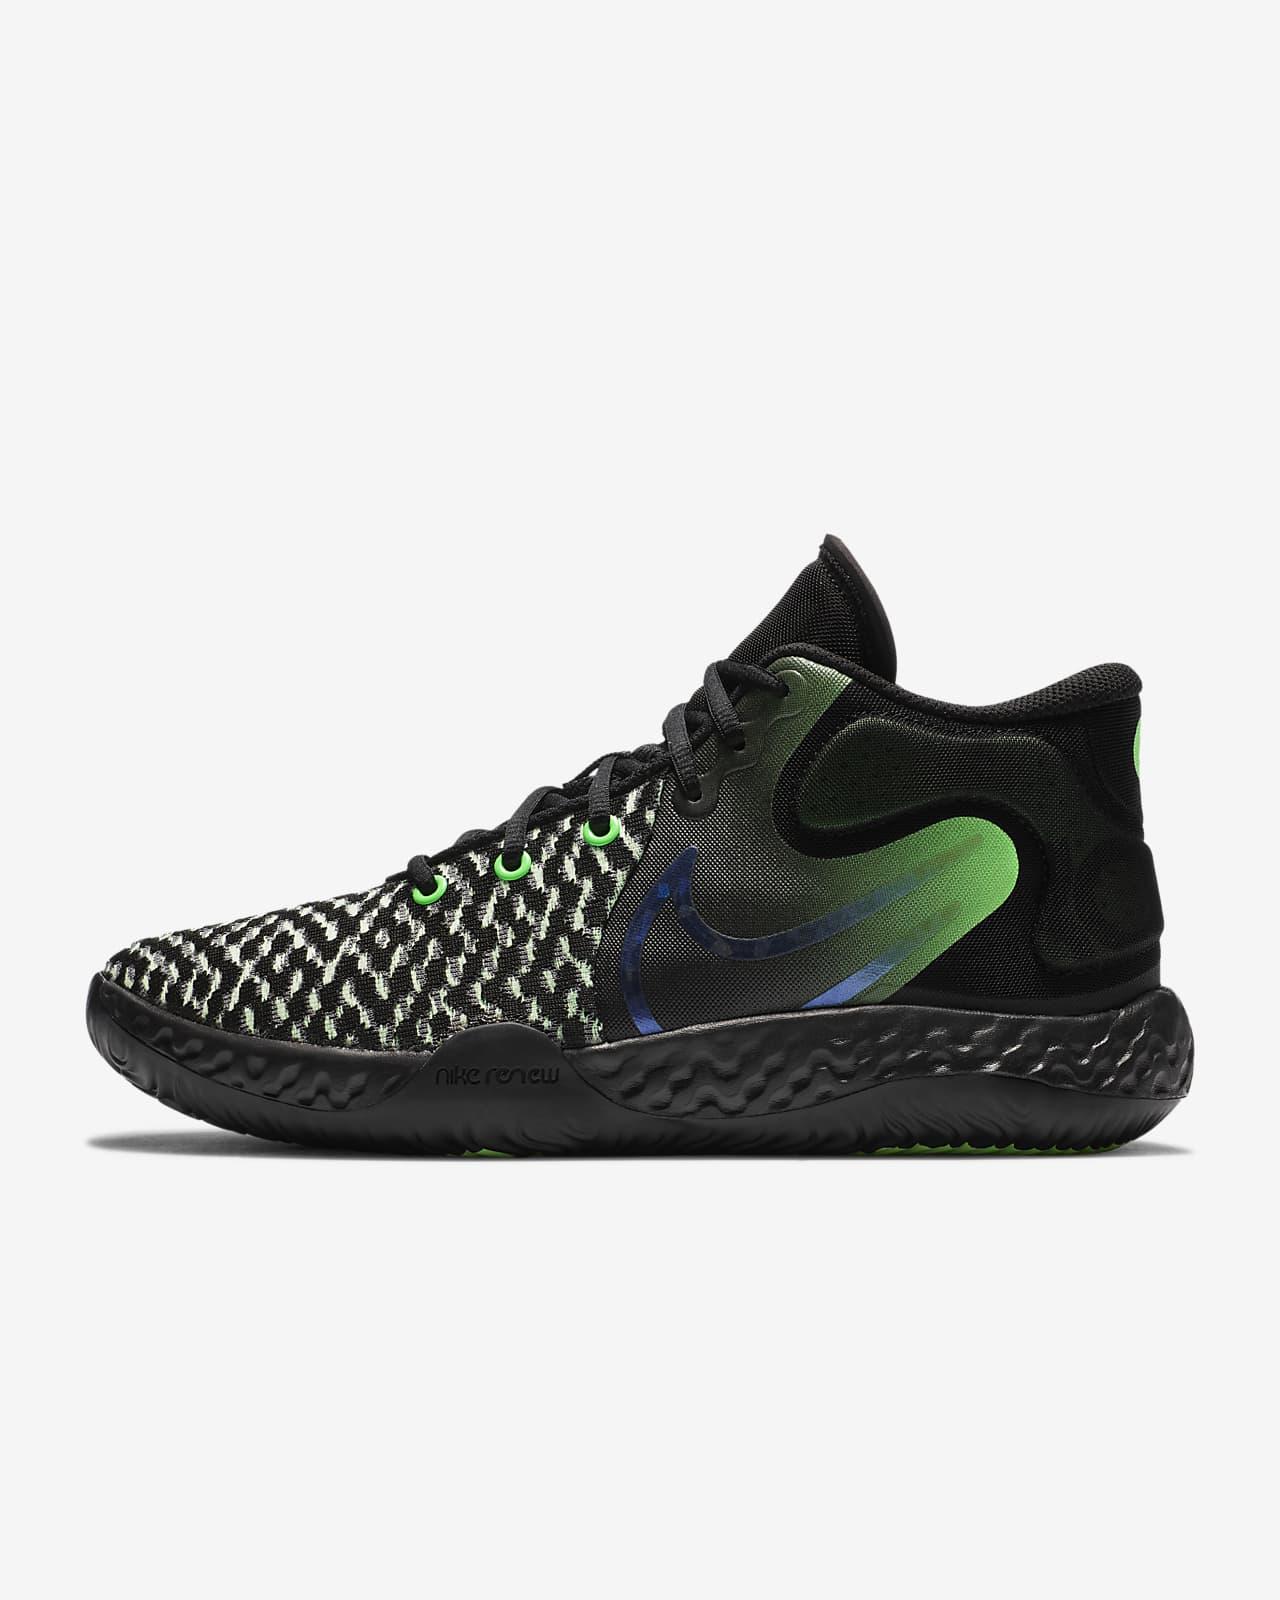 KD Trey 5 VIII EP 男/女篮球鞋